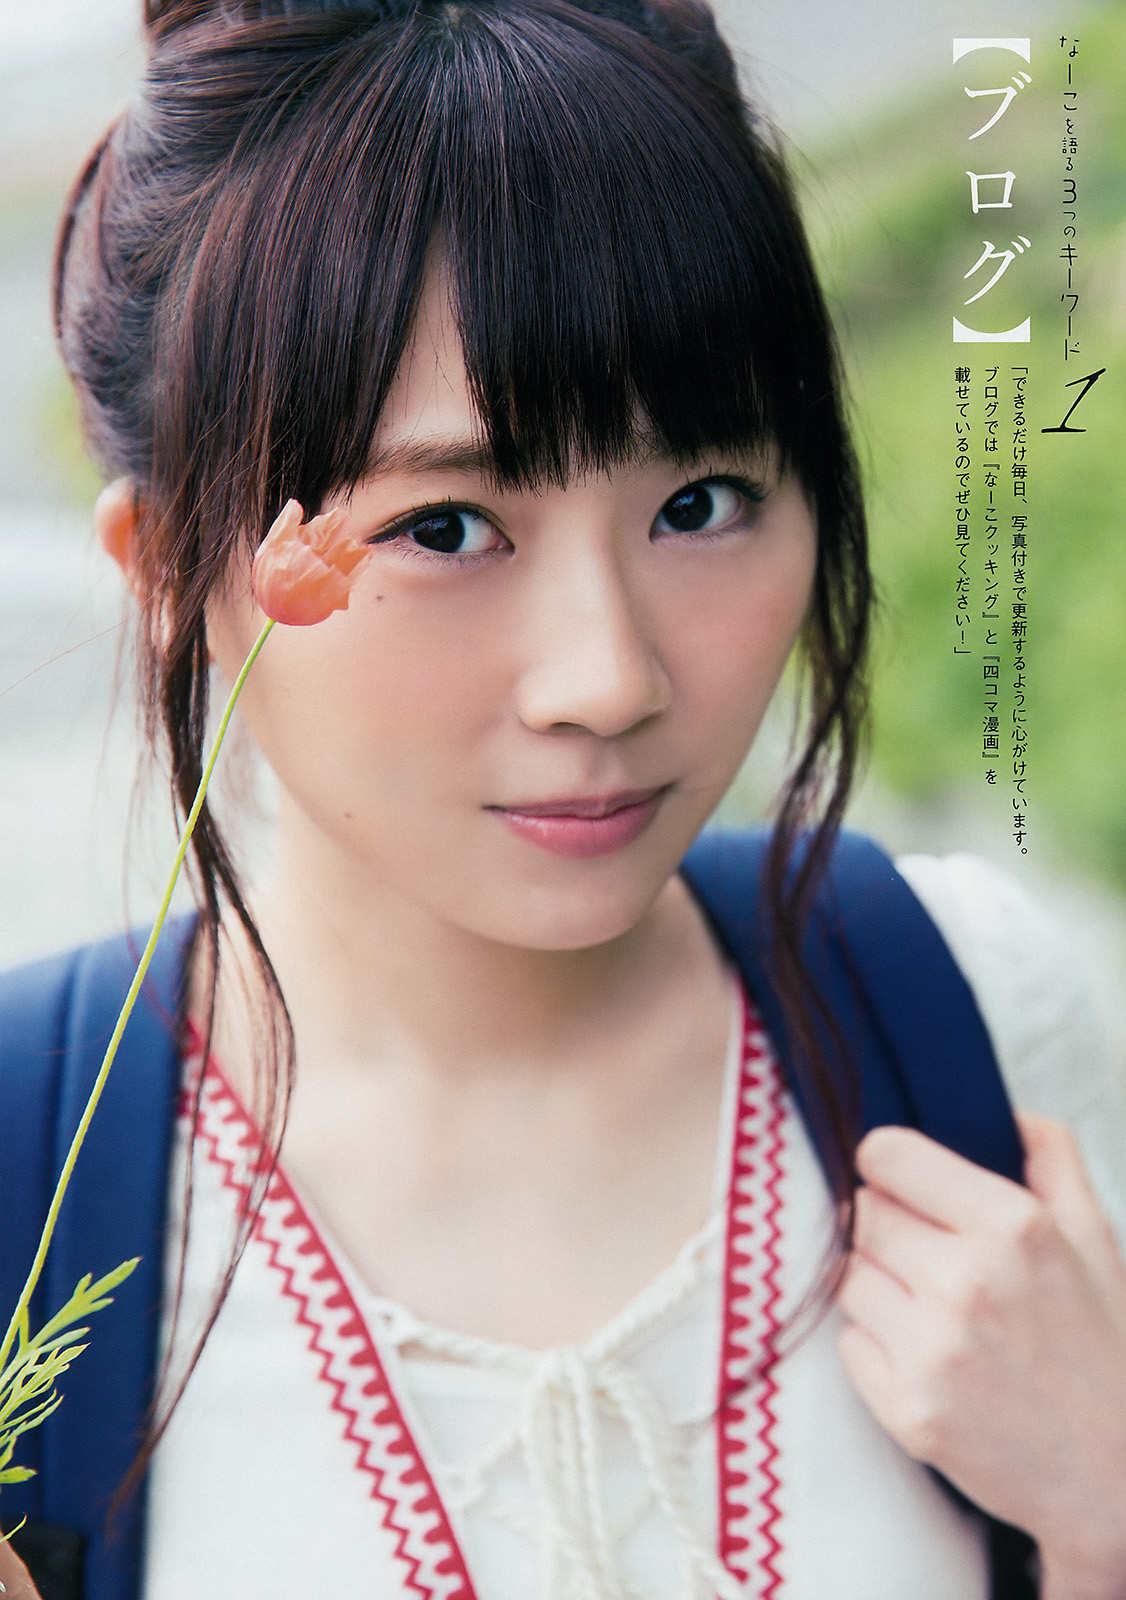 Nagasawa Nanako 長沢菜々香 Keyakizaka46, Young Magazine 2017.06.12 No.26 (週刊ヤングマガジン 2017年26号)